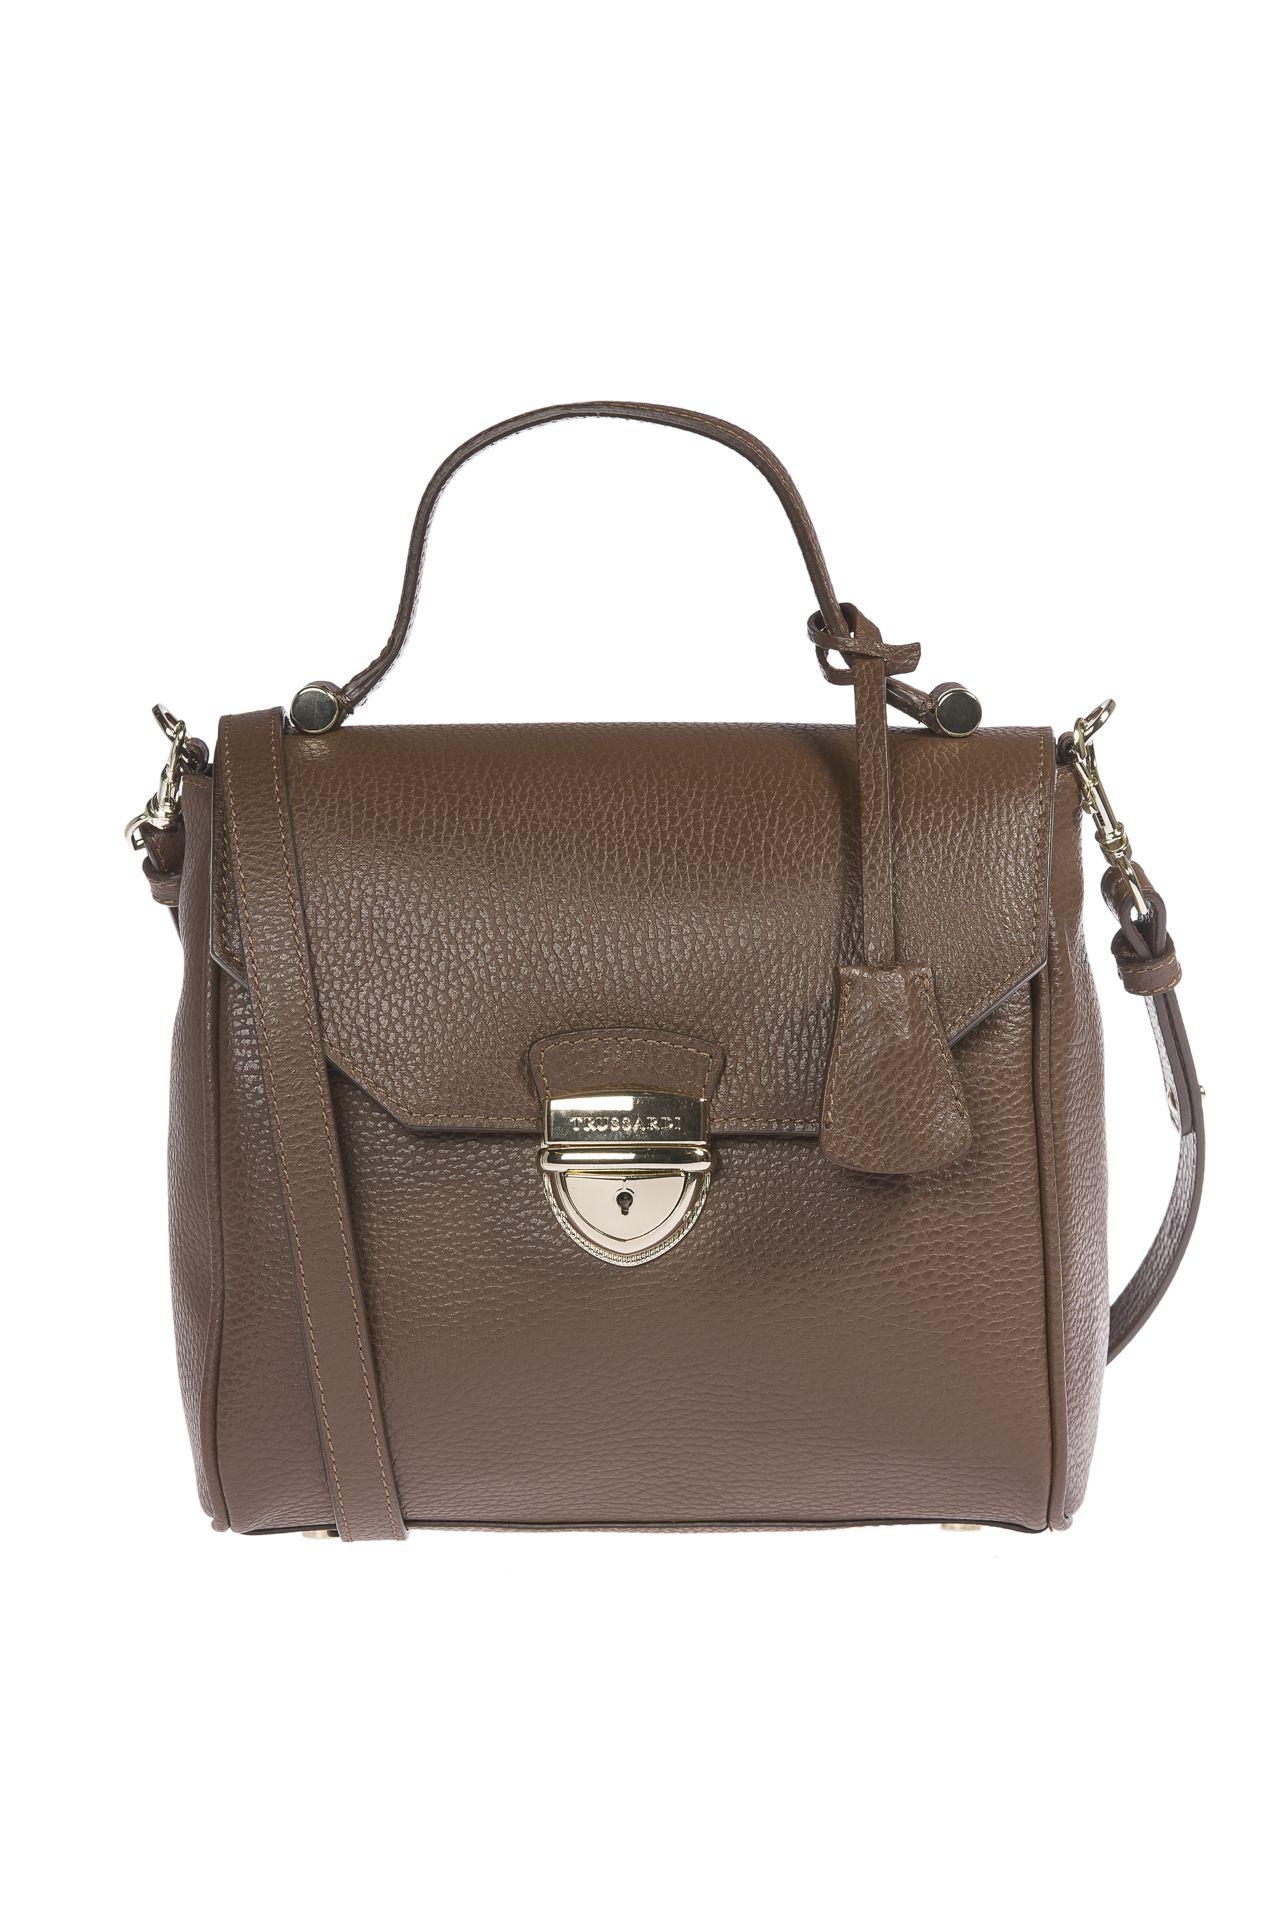 Trussardi Women's Handbag Brown 1DB486_69DarkBrown